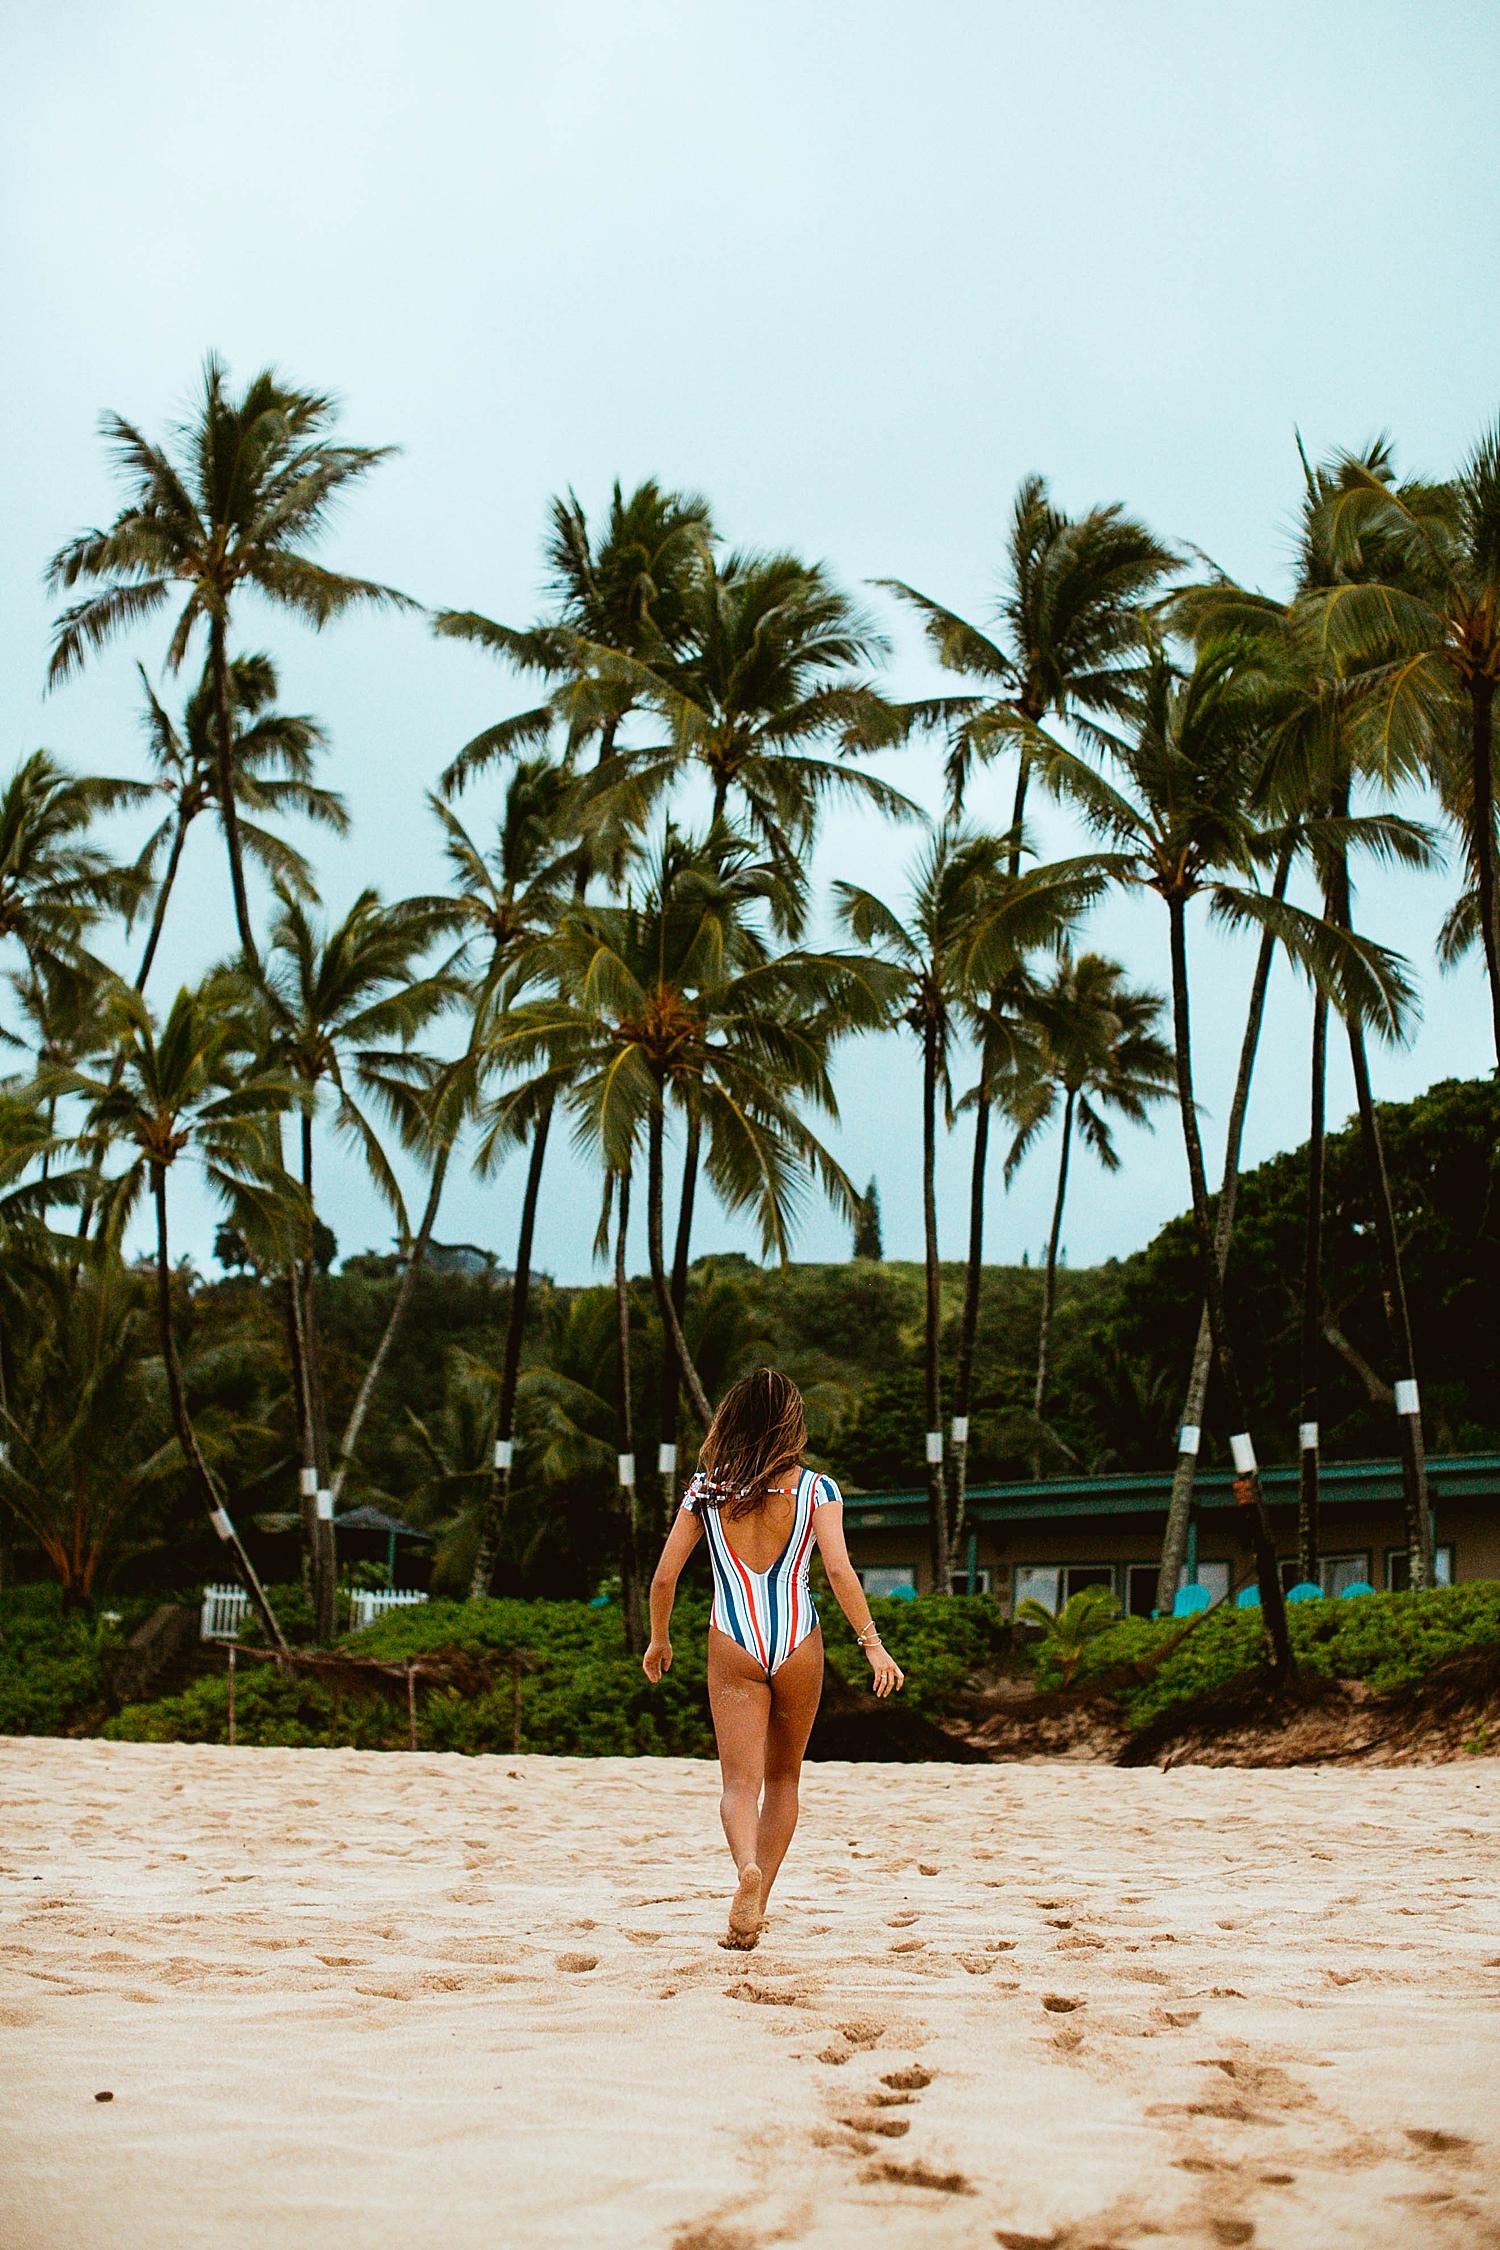 Travel & Lifestyle Fashion Photography with Benoa Swim, Cami and Jax, Bailey Nagy and Kiana Fores by Kelee Bovelle on North Shore Oahu Hawaii_0043.jpg